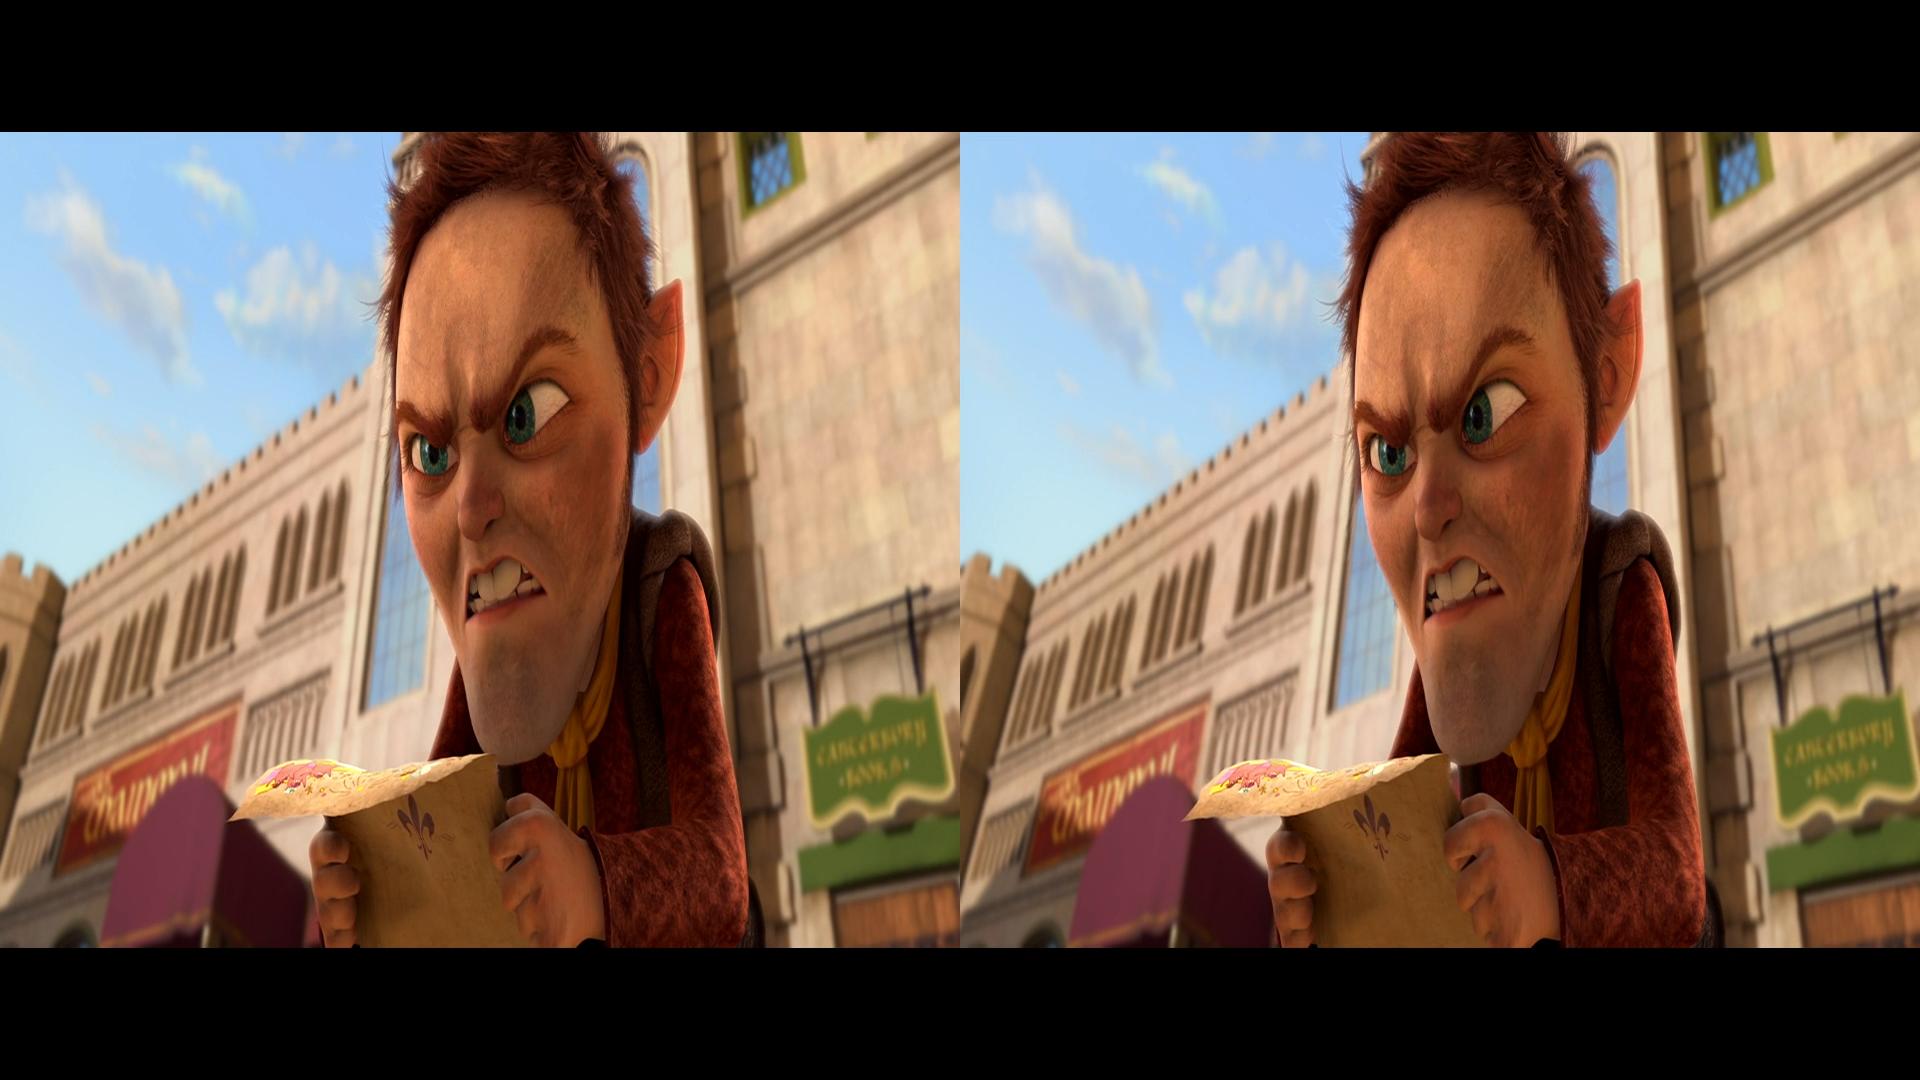 Şrek 4 - Shrek 4 2010 3D (1080p Bluray H-SBS) DUAL TR-EN - 3D Film indir